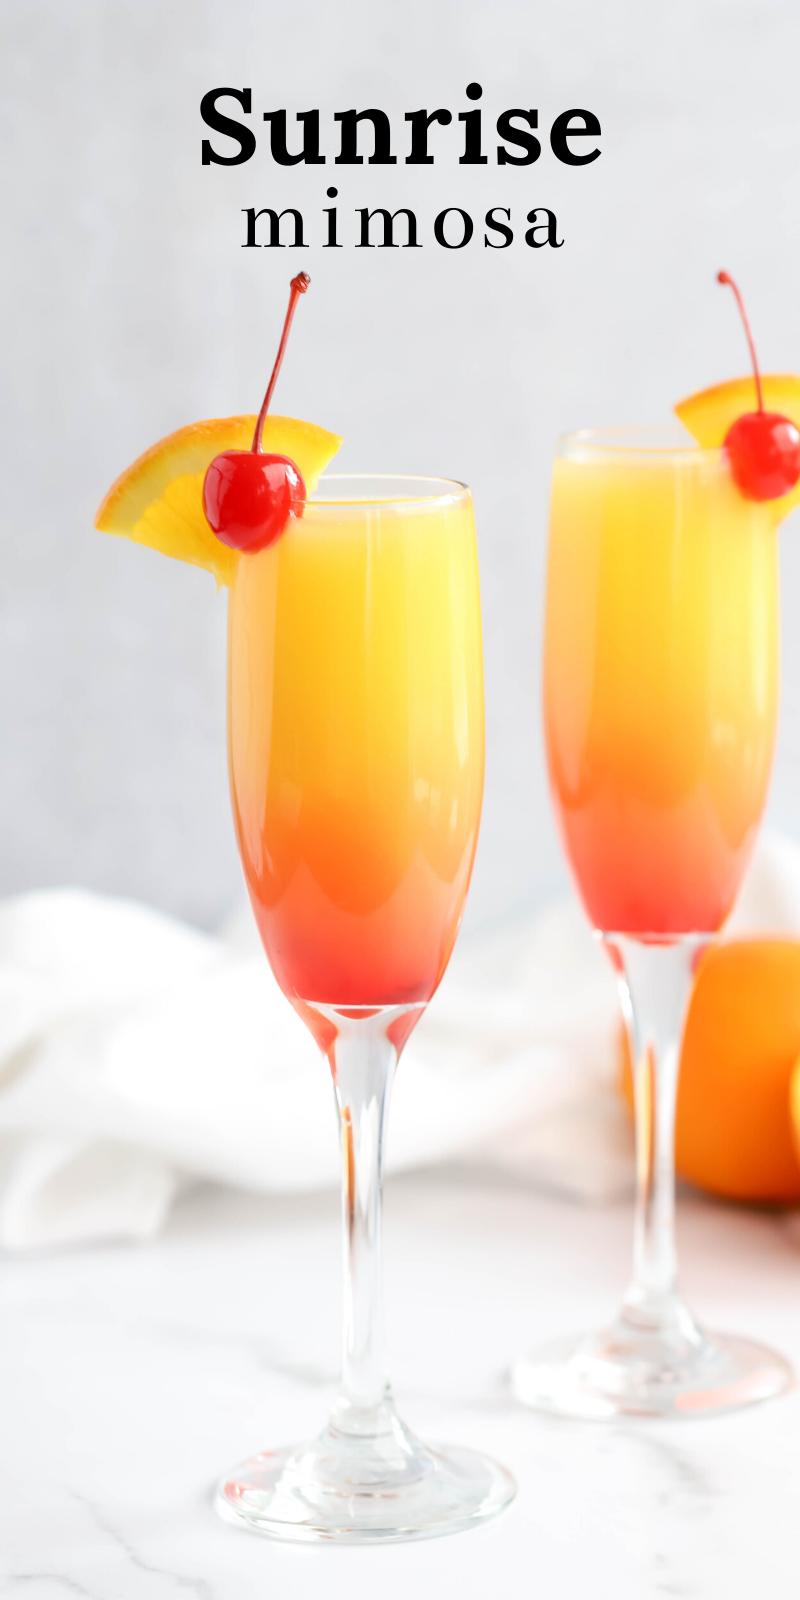 Sunrise Mimosa Simply Made Recipes Recipe Drinks Alcohol Recipes Brunch Drinks Alcohol Recipes